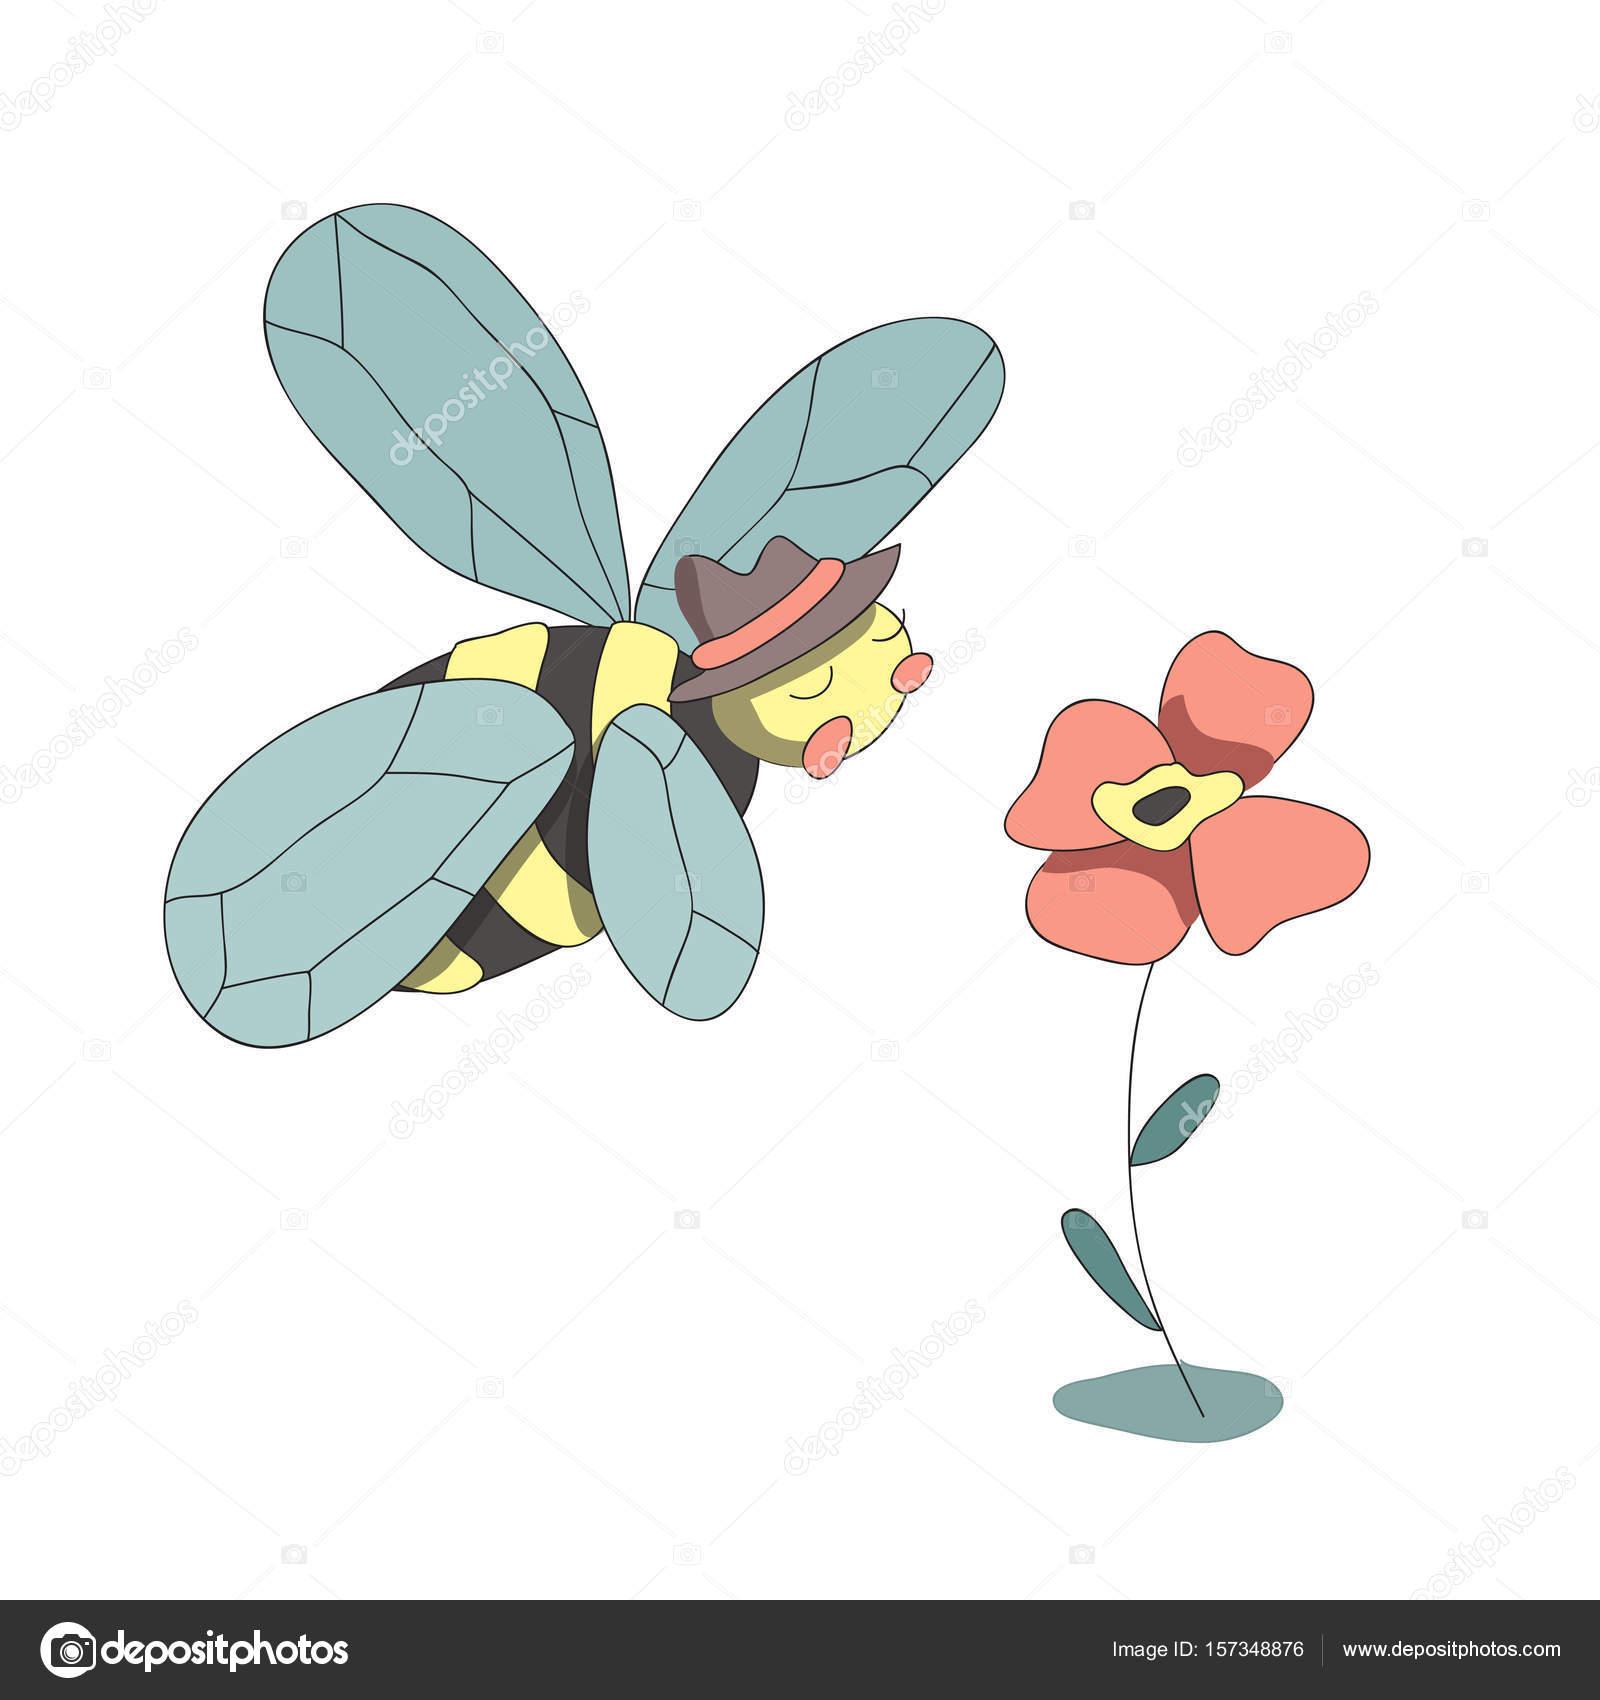 Dessin Anime Mignon Abeille Et Fleur Vector Illustration Isolee